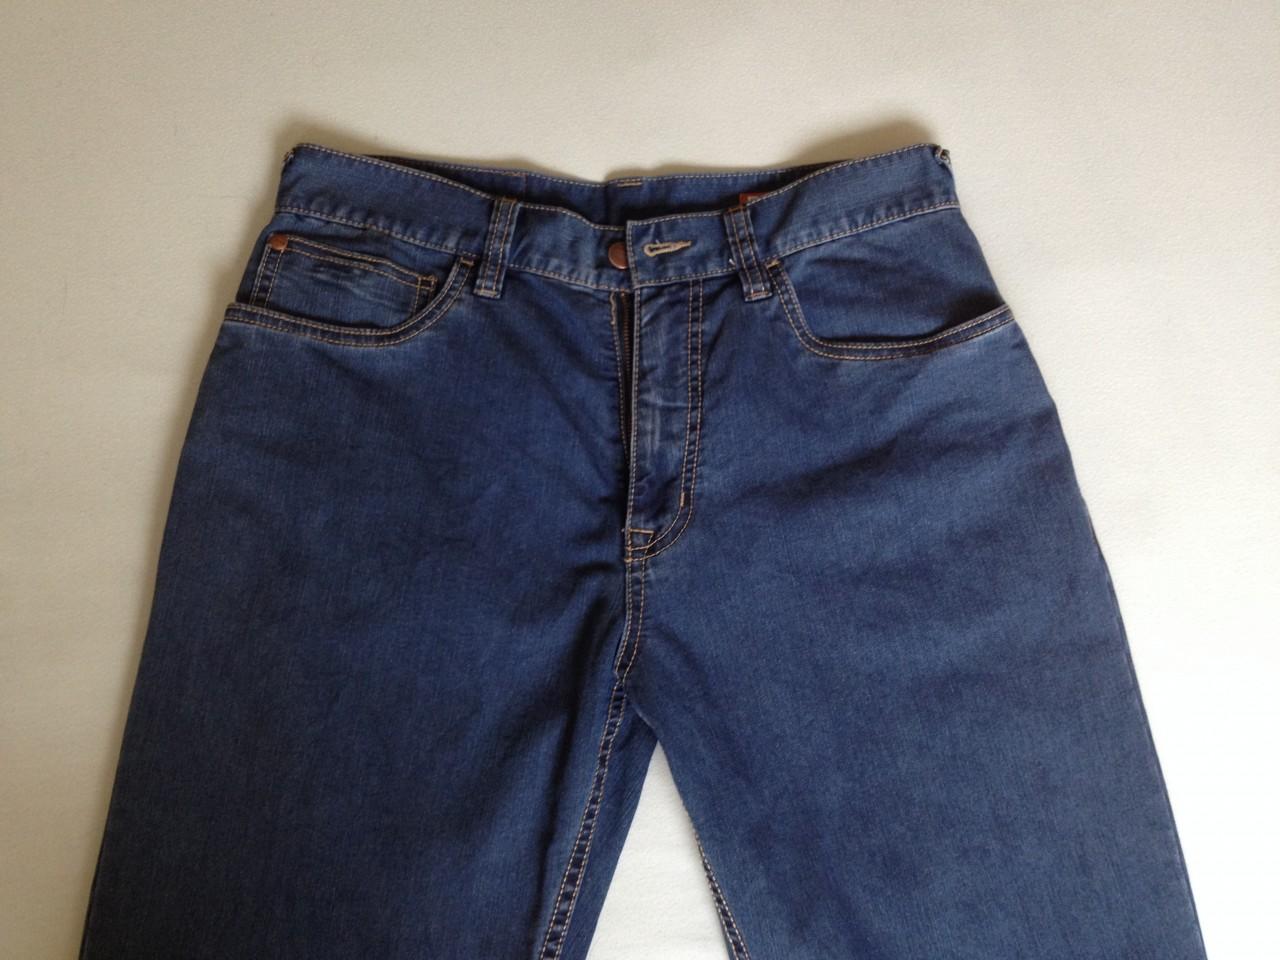 Rohan Jeans Plus front